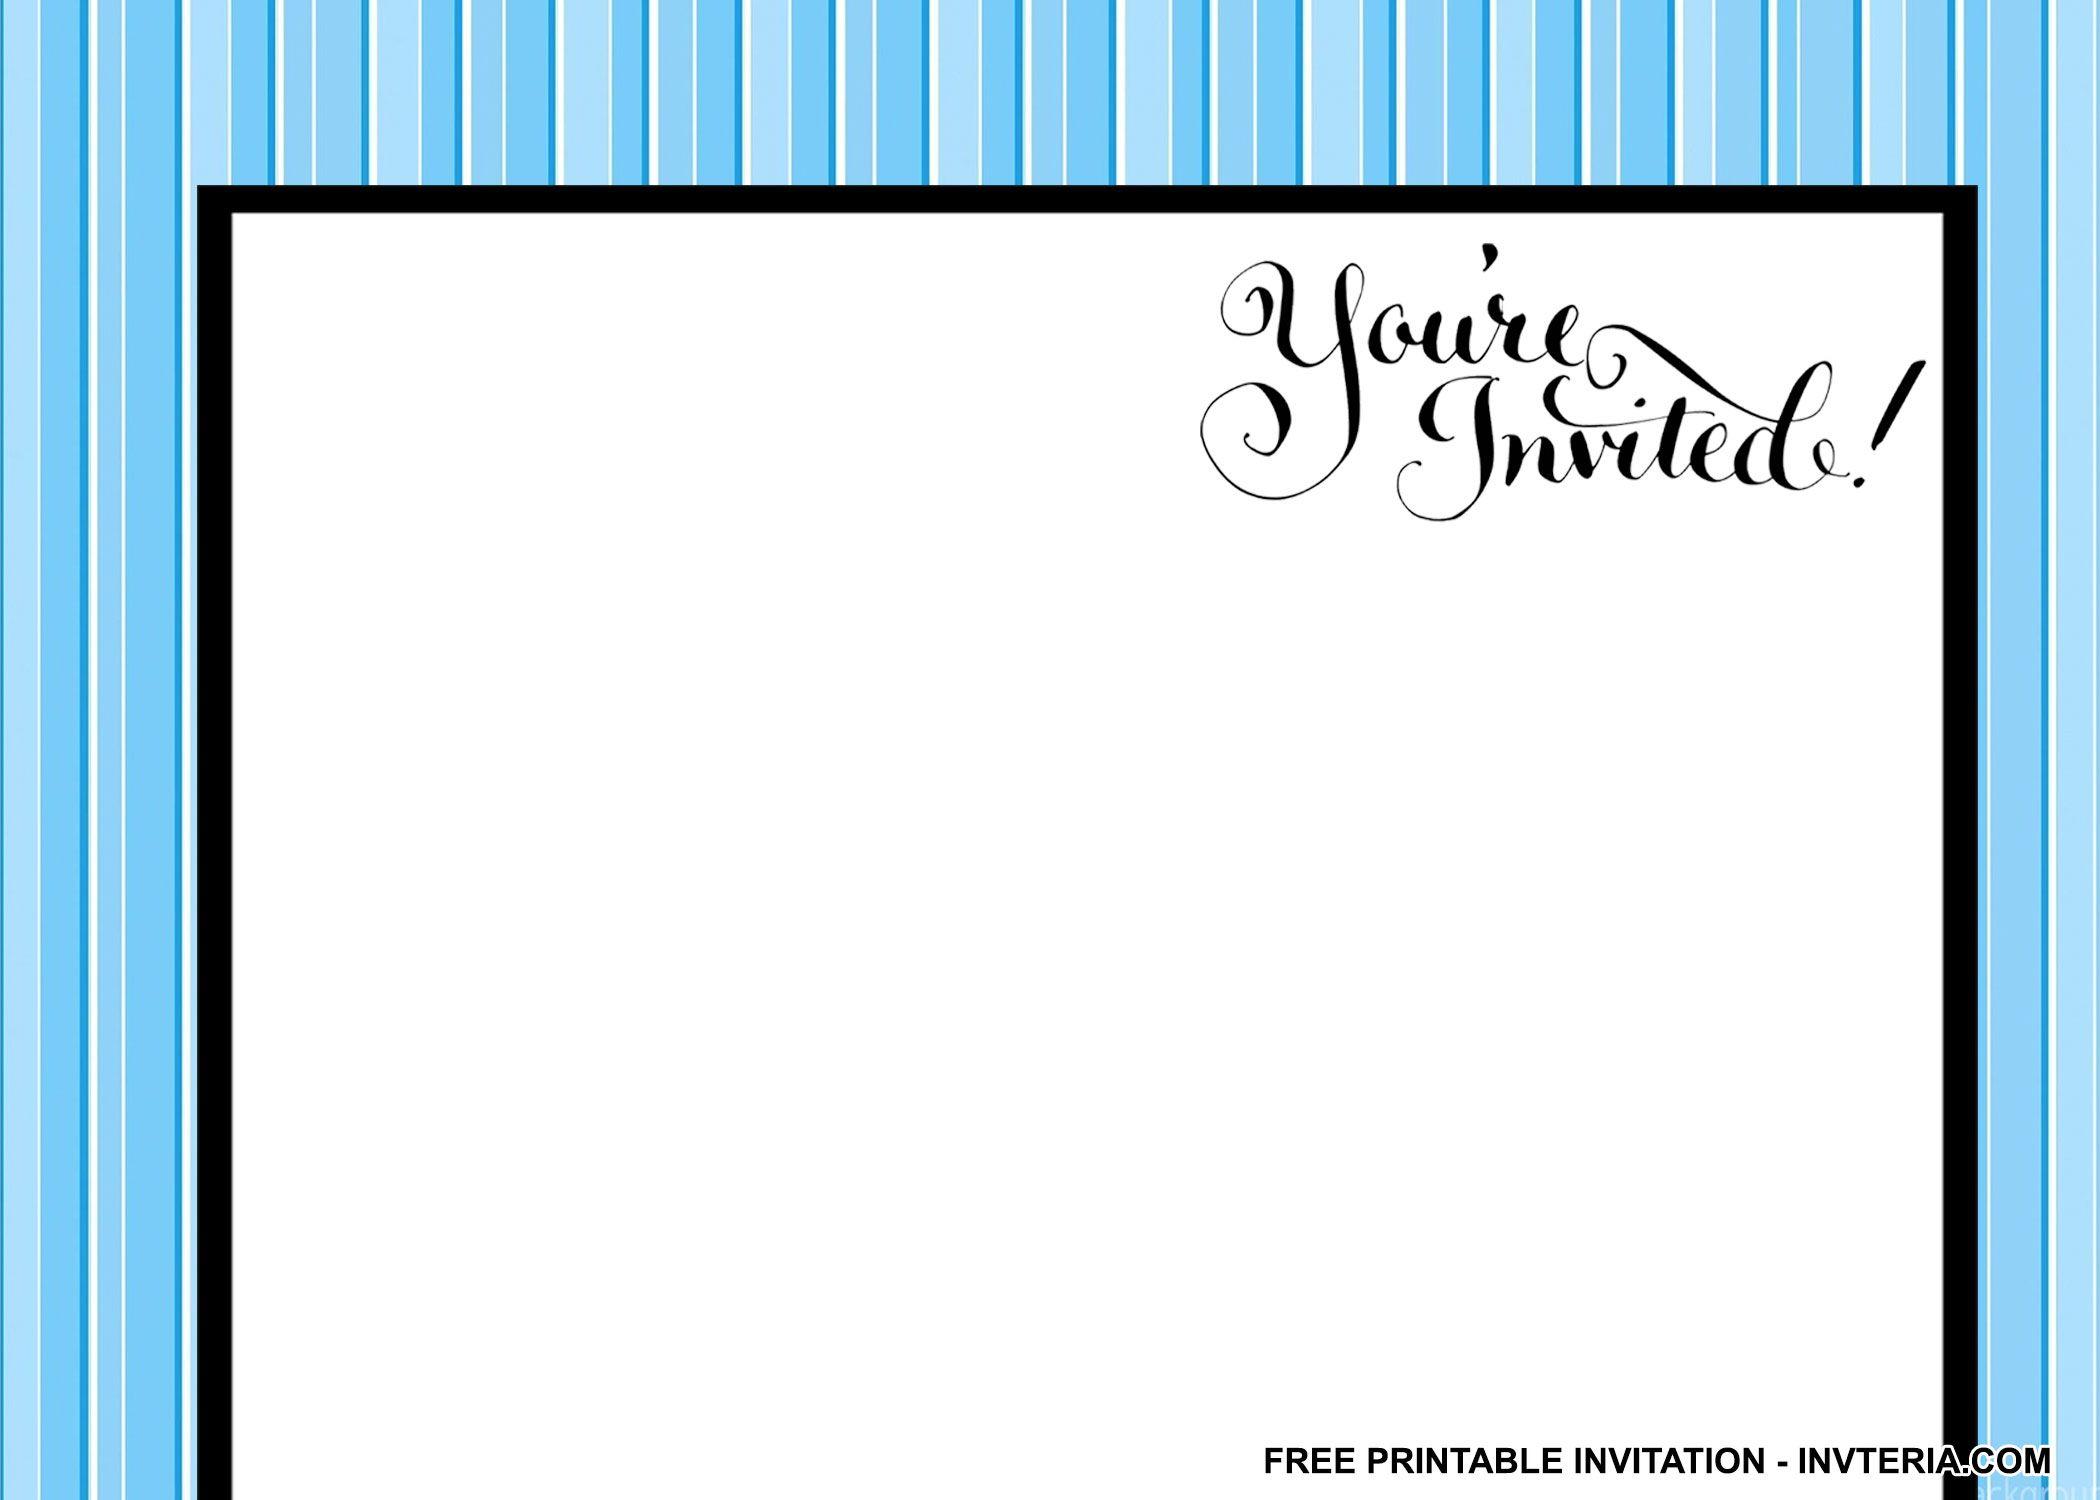 NICE FREE MAKE BIRTHDAY INVITATIONS ONLINE IDEA